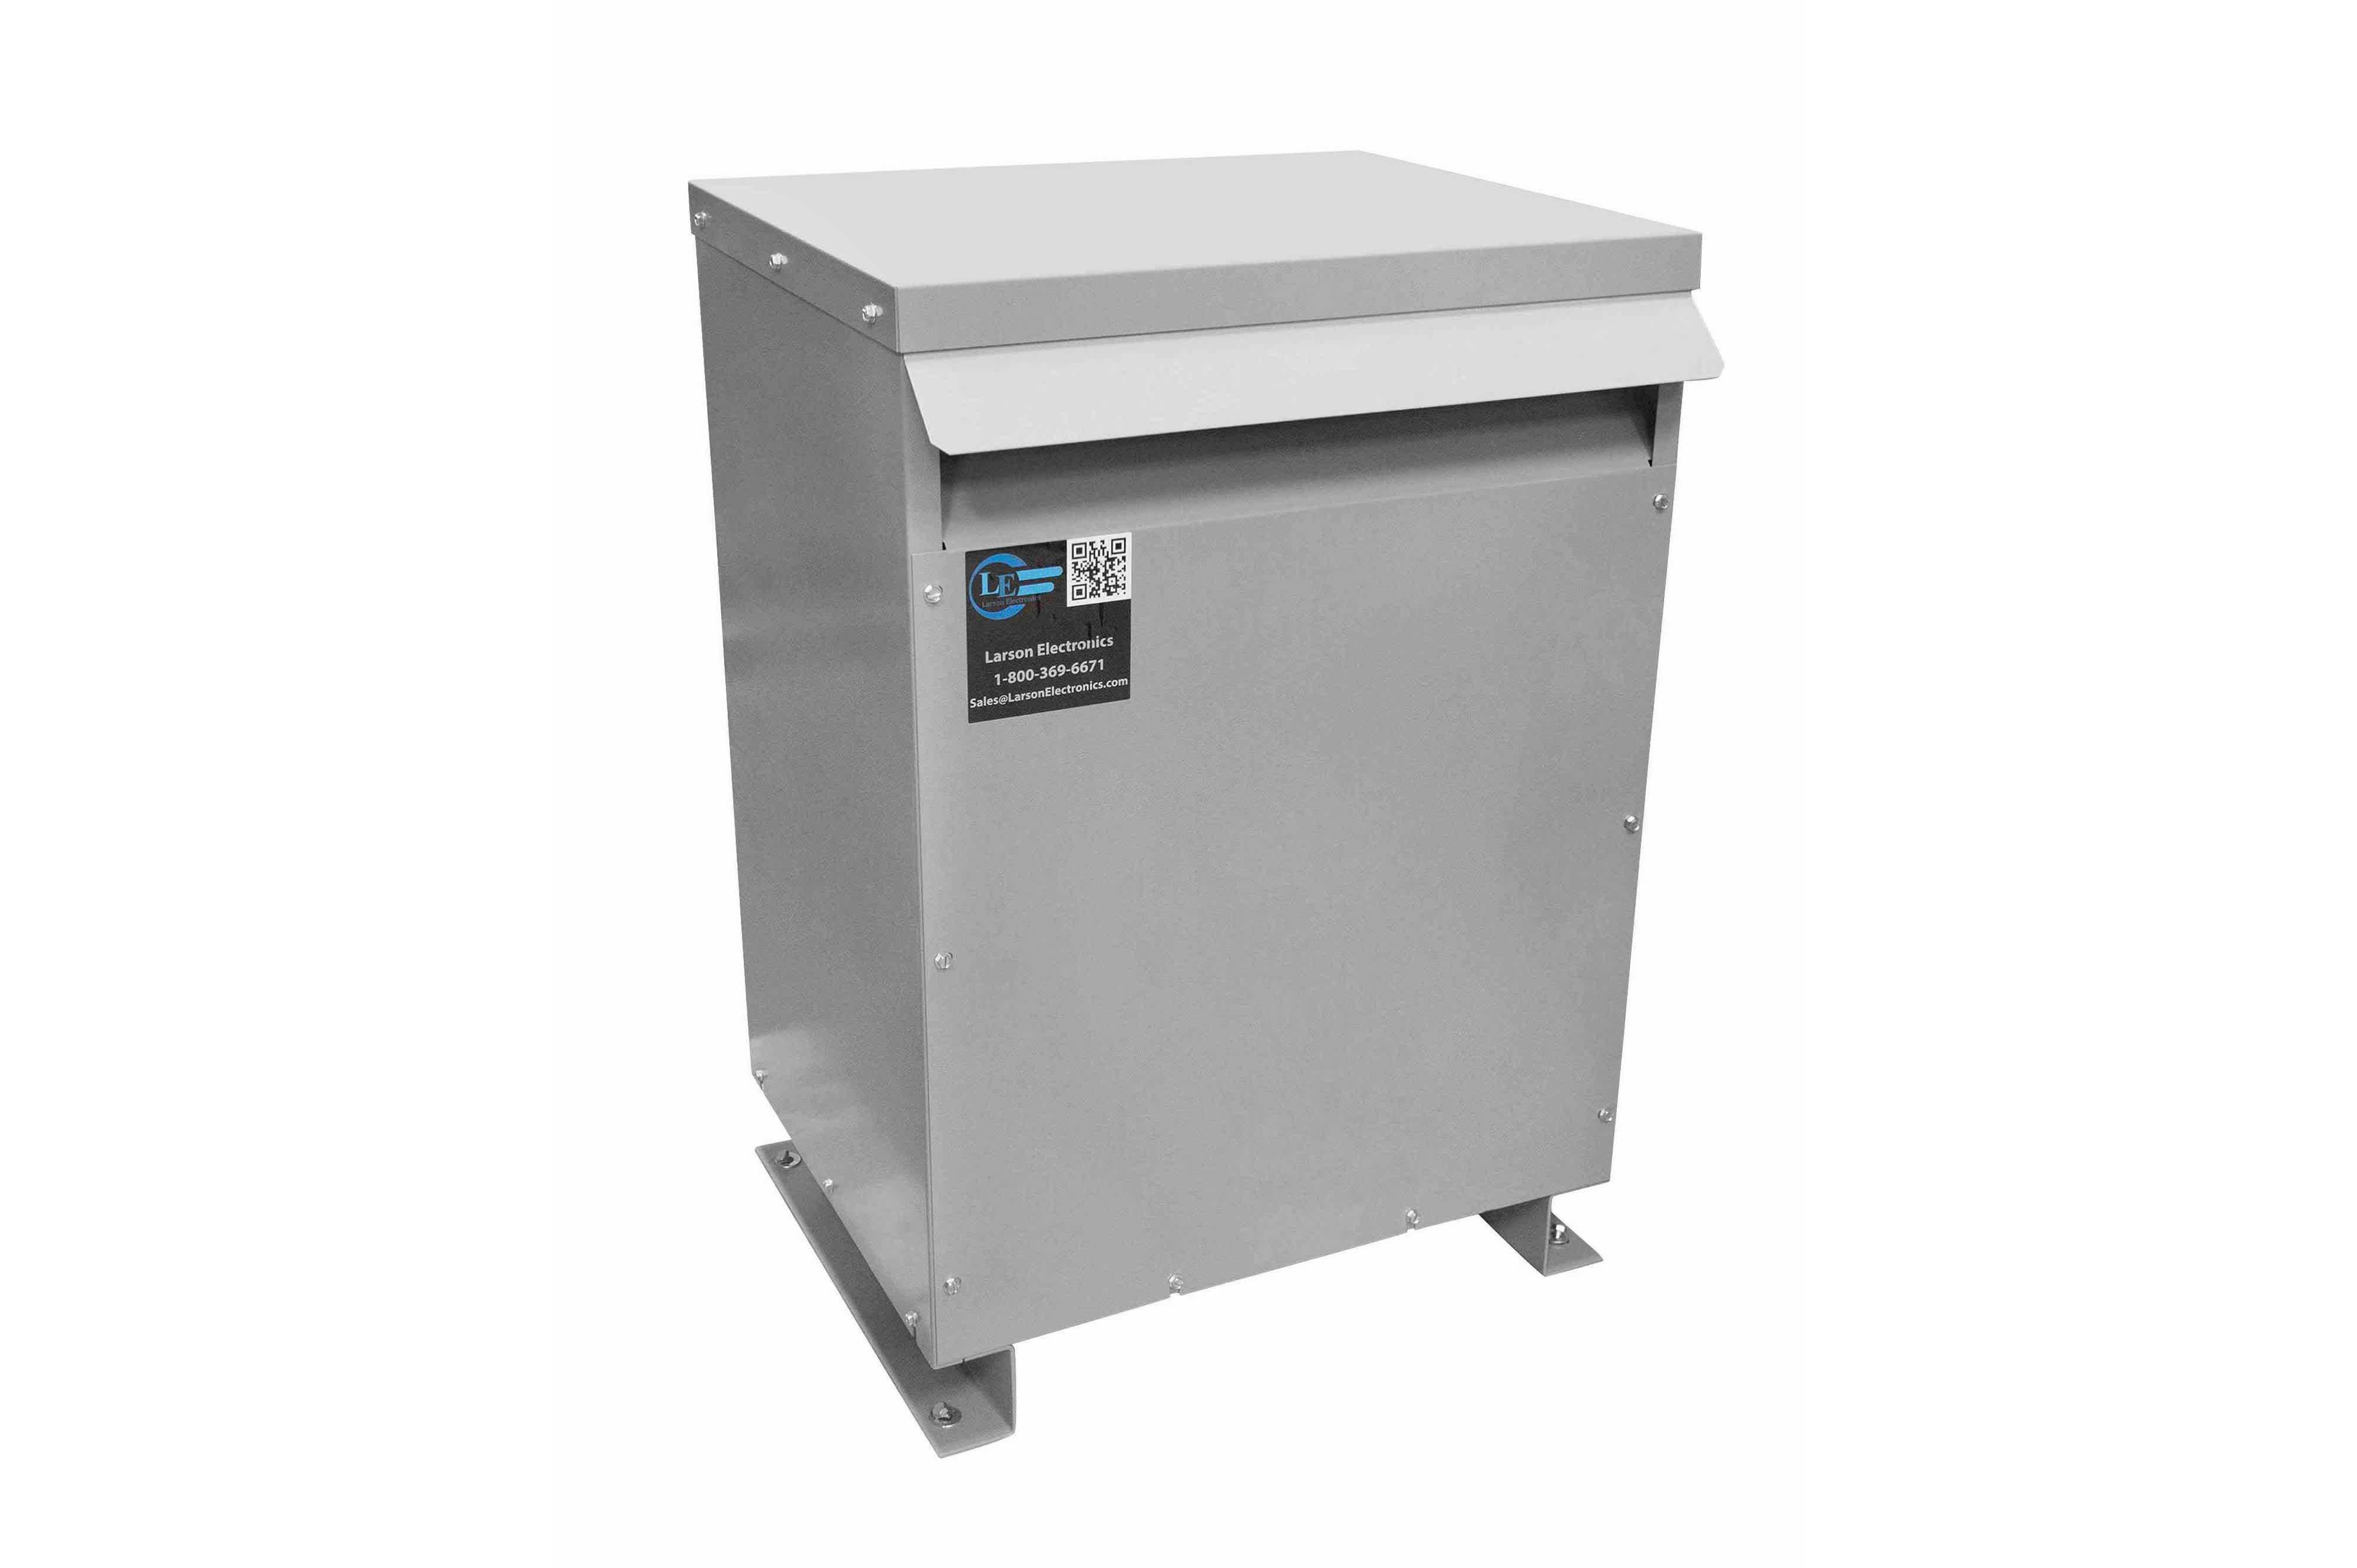 100 kVA 3PH Isolation Transformer, 460V Wye Primary, 575V Delta Secondary, N3R, Ventilated, 60 Hz